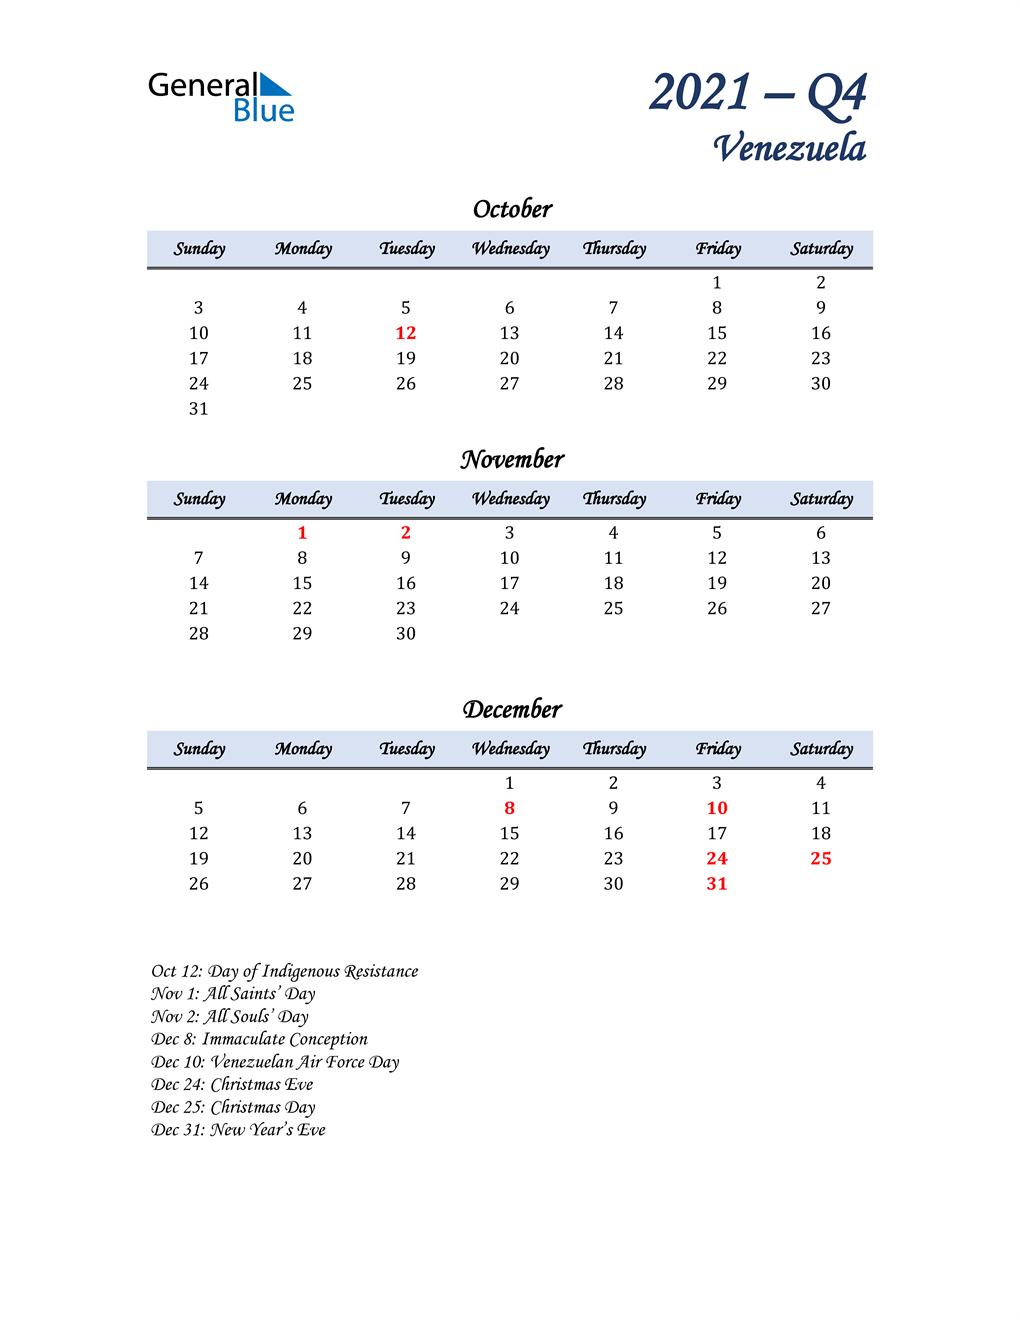 October, November, and December Calendar for Venezuela